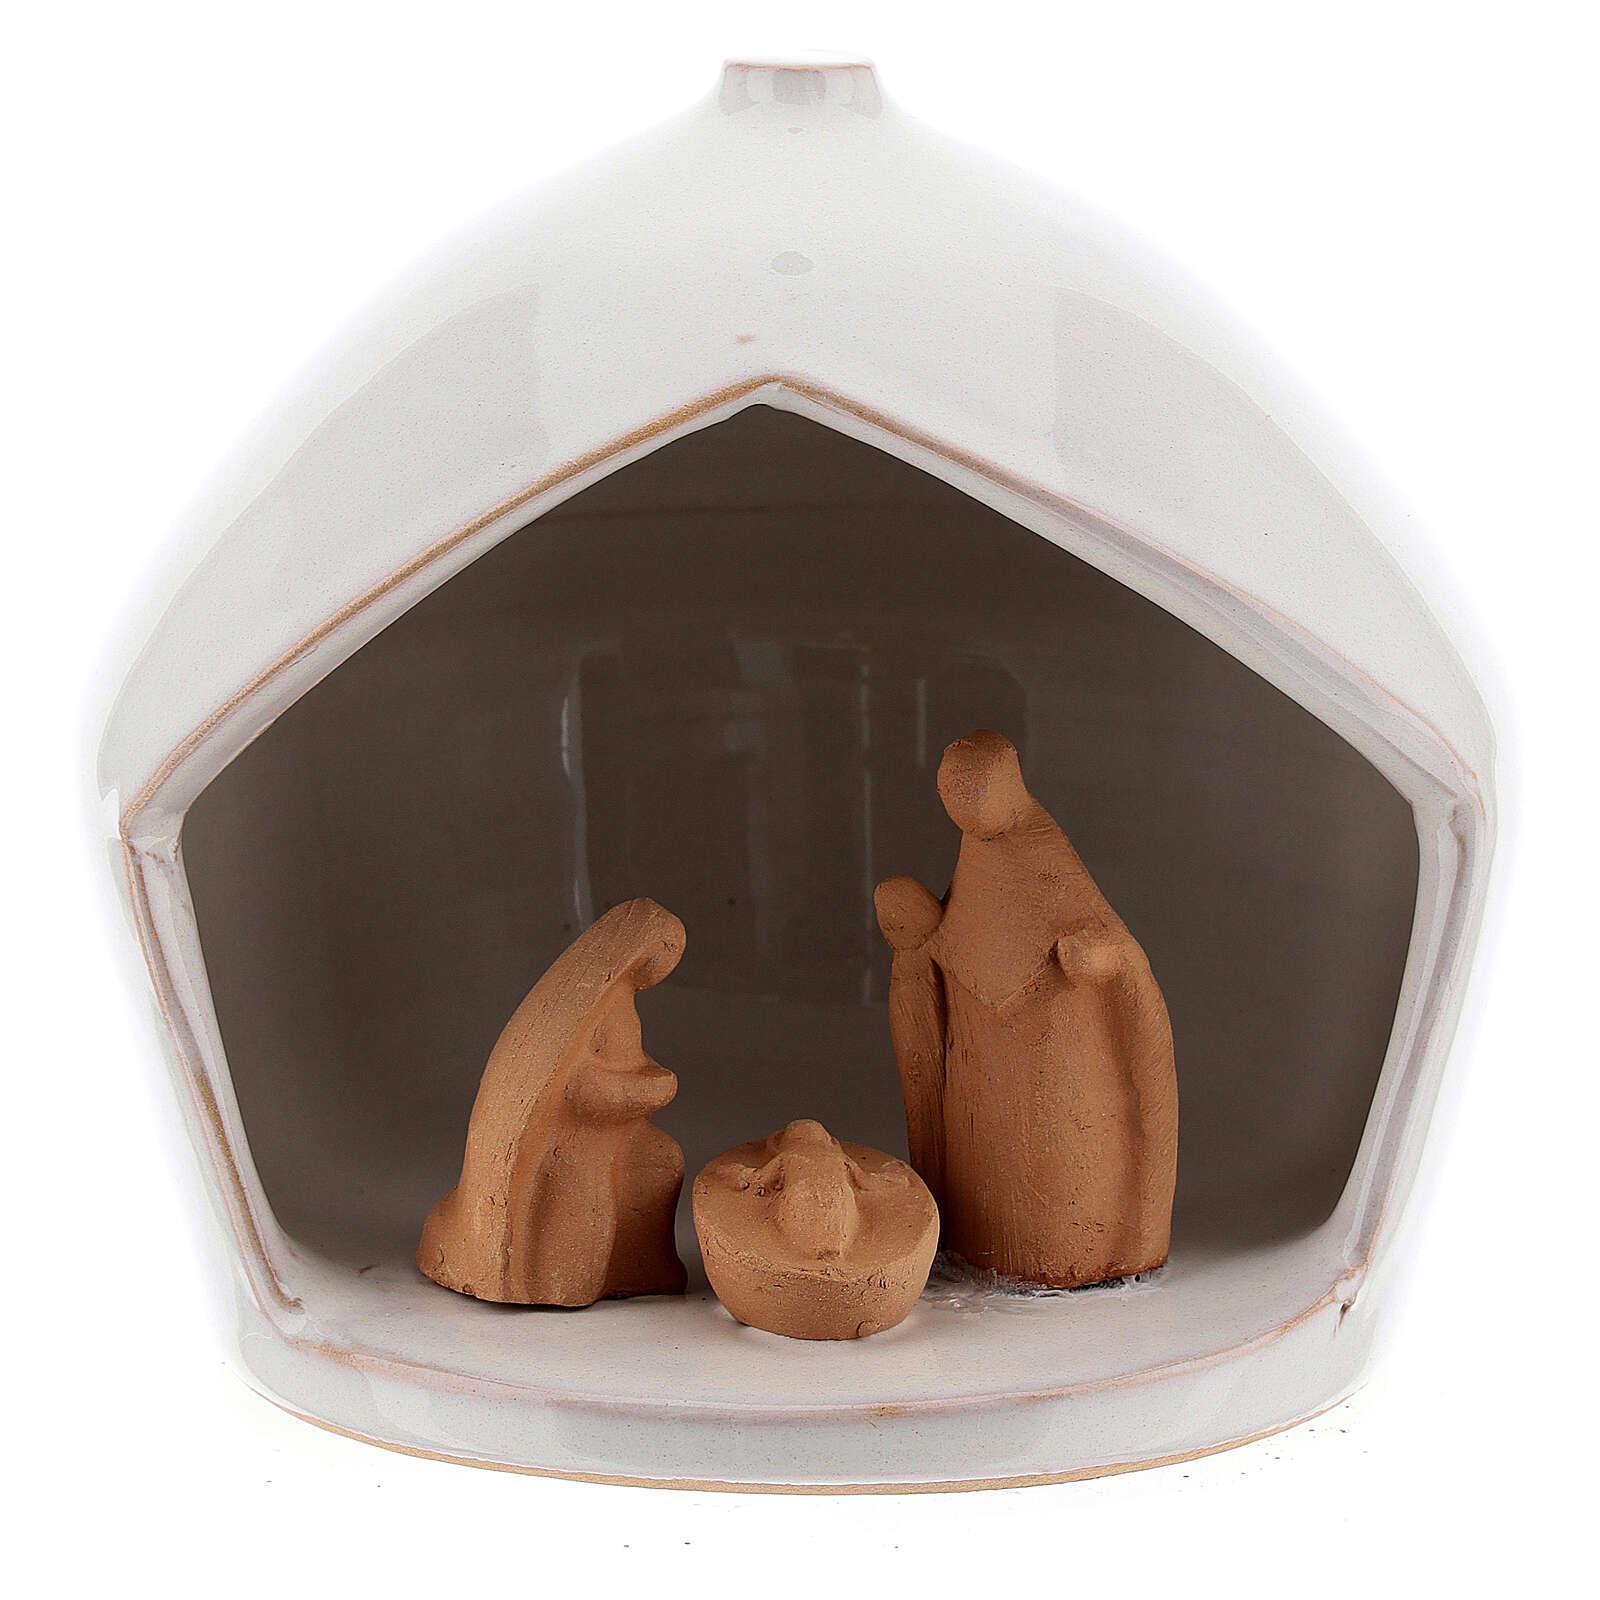 Cabaña belén Natividad bicolor terracota Deruta 12x11 cm 4